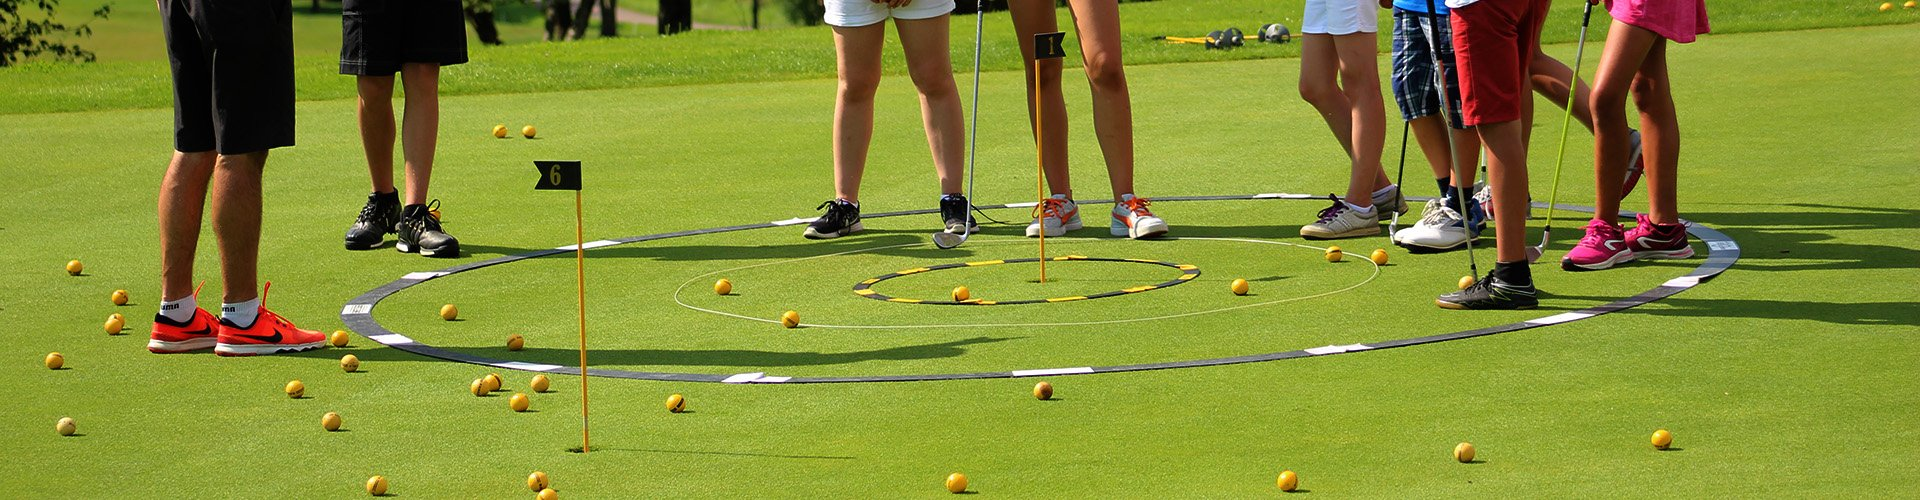 bandeau-ecole-golf.jpg